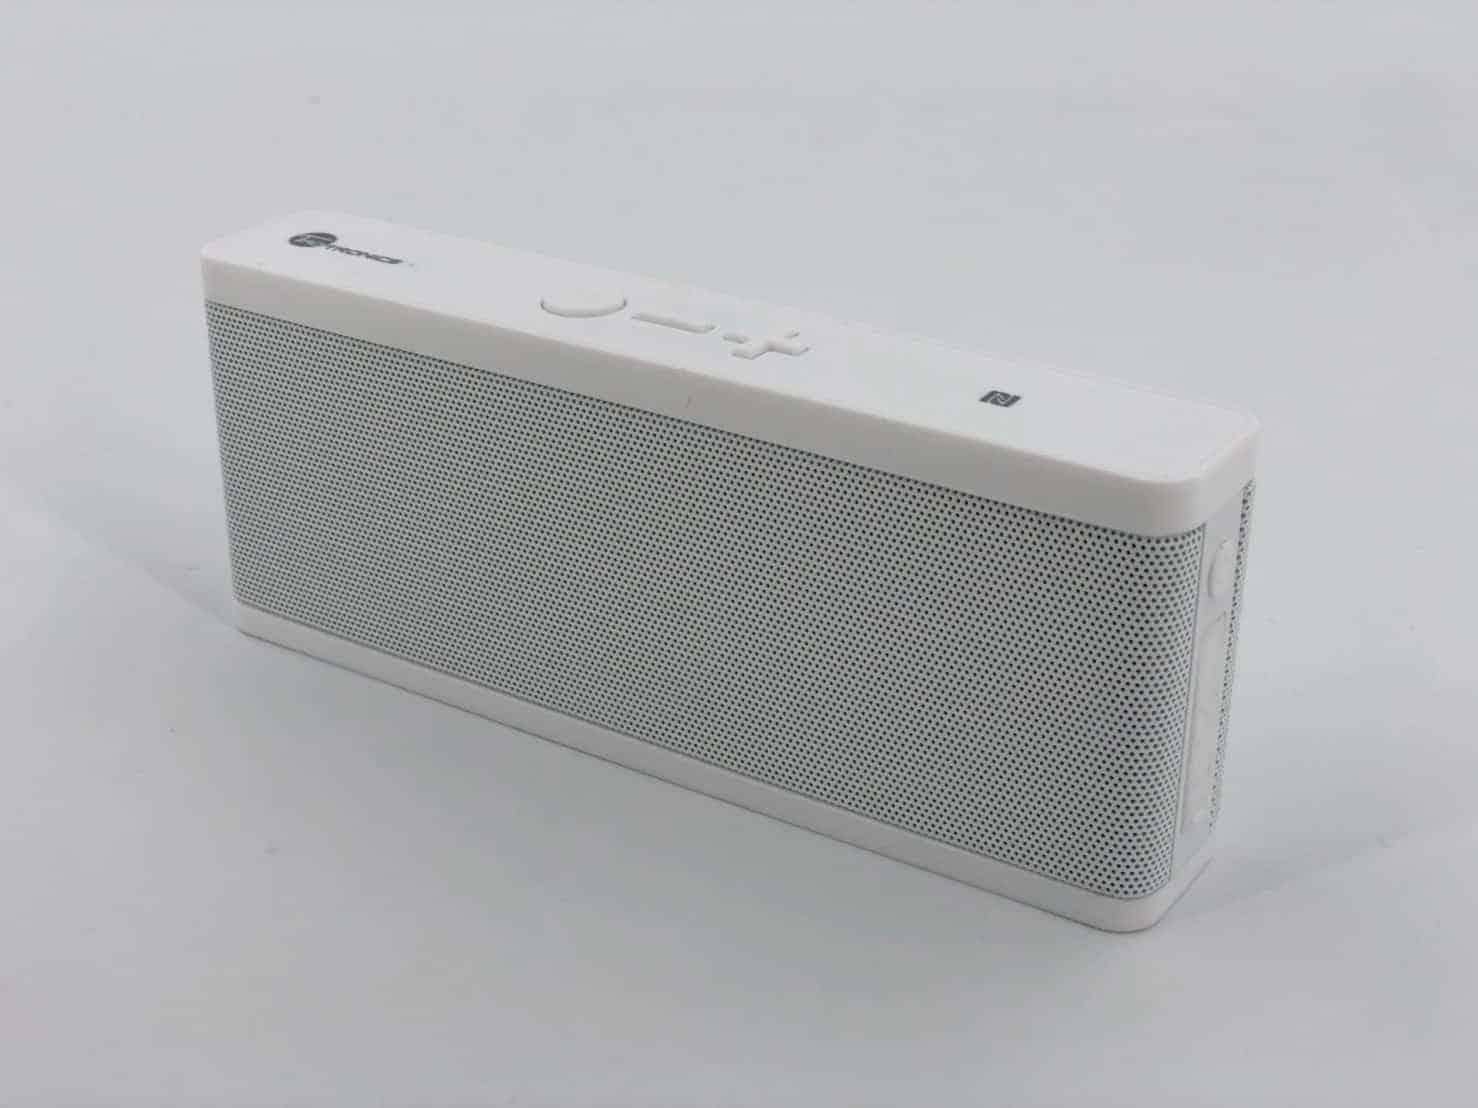 Sony XB01及JBL GO都望塵莫及的好聲音 – TaoTronics TT-SK09防水藍芽喇叭推薦